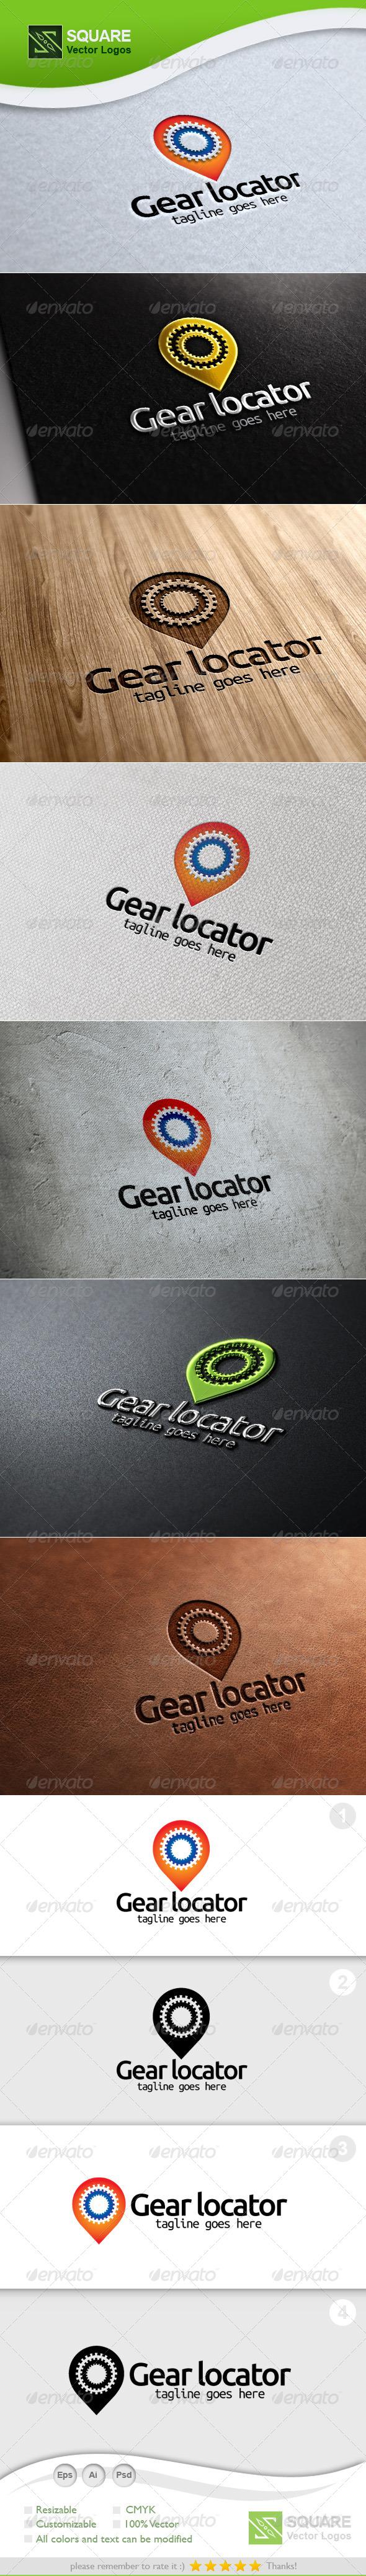 Gear, Locator Vector Logo Template - Objects Logo Templates